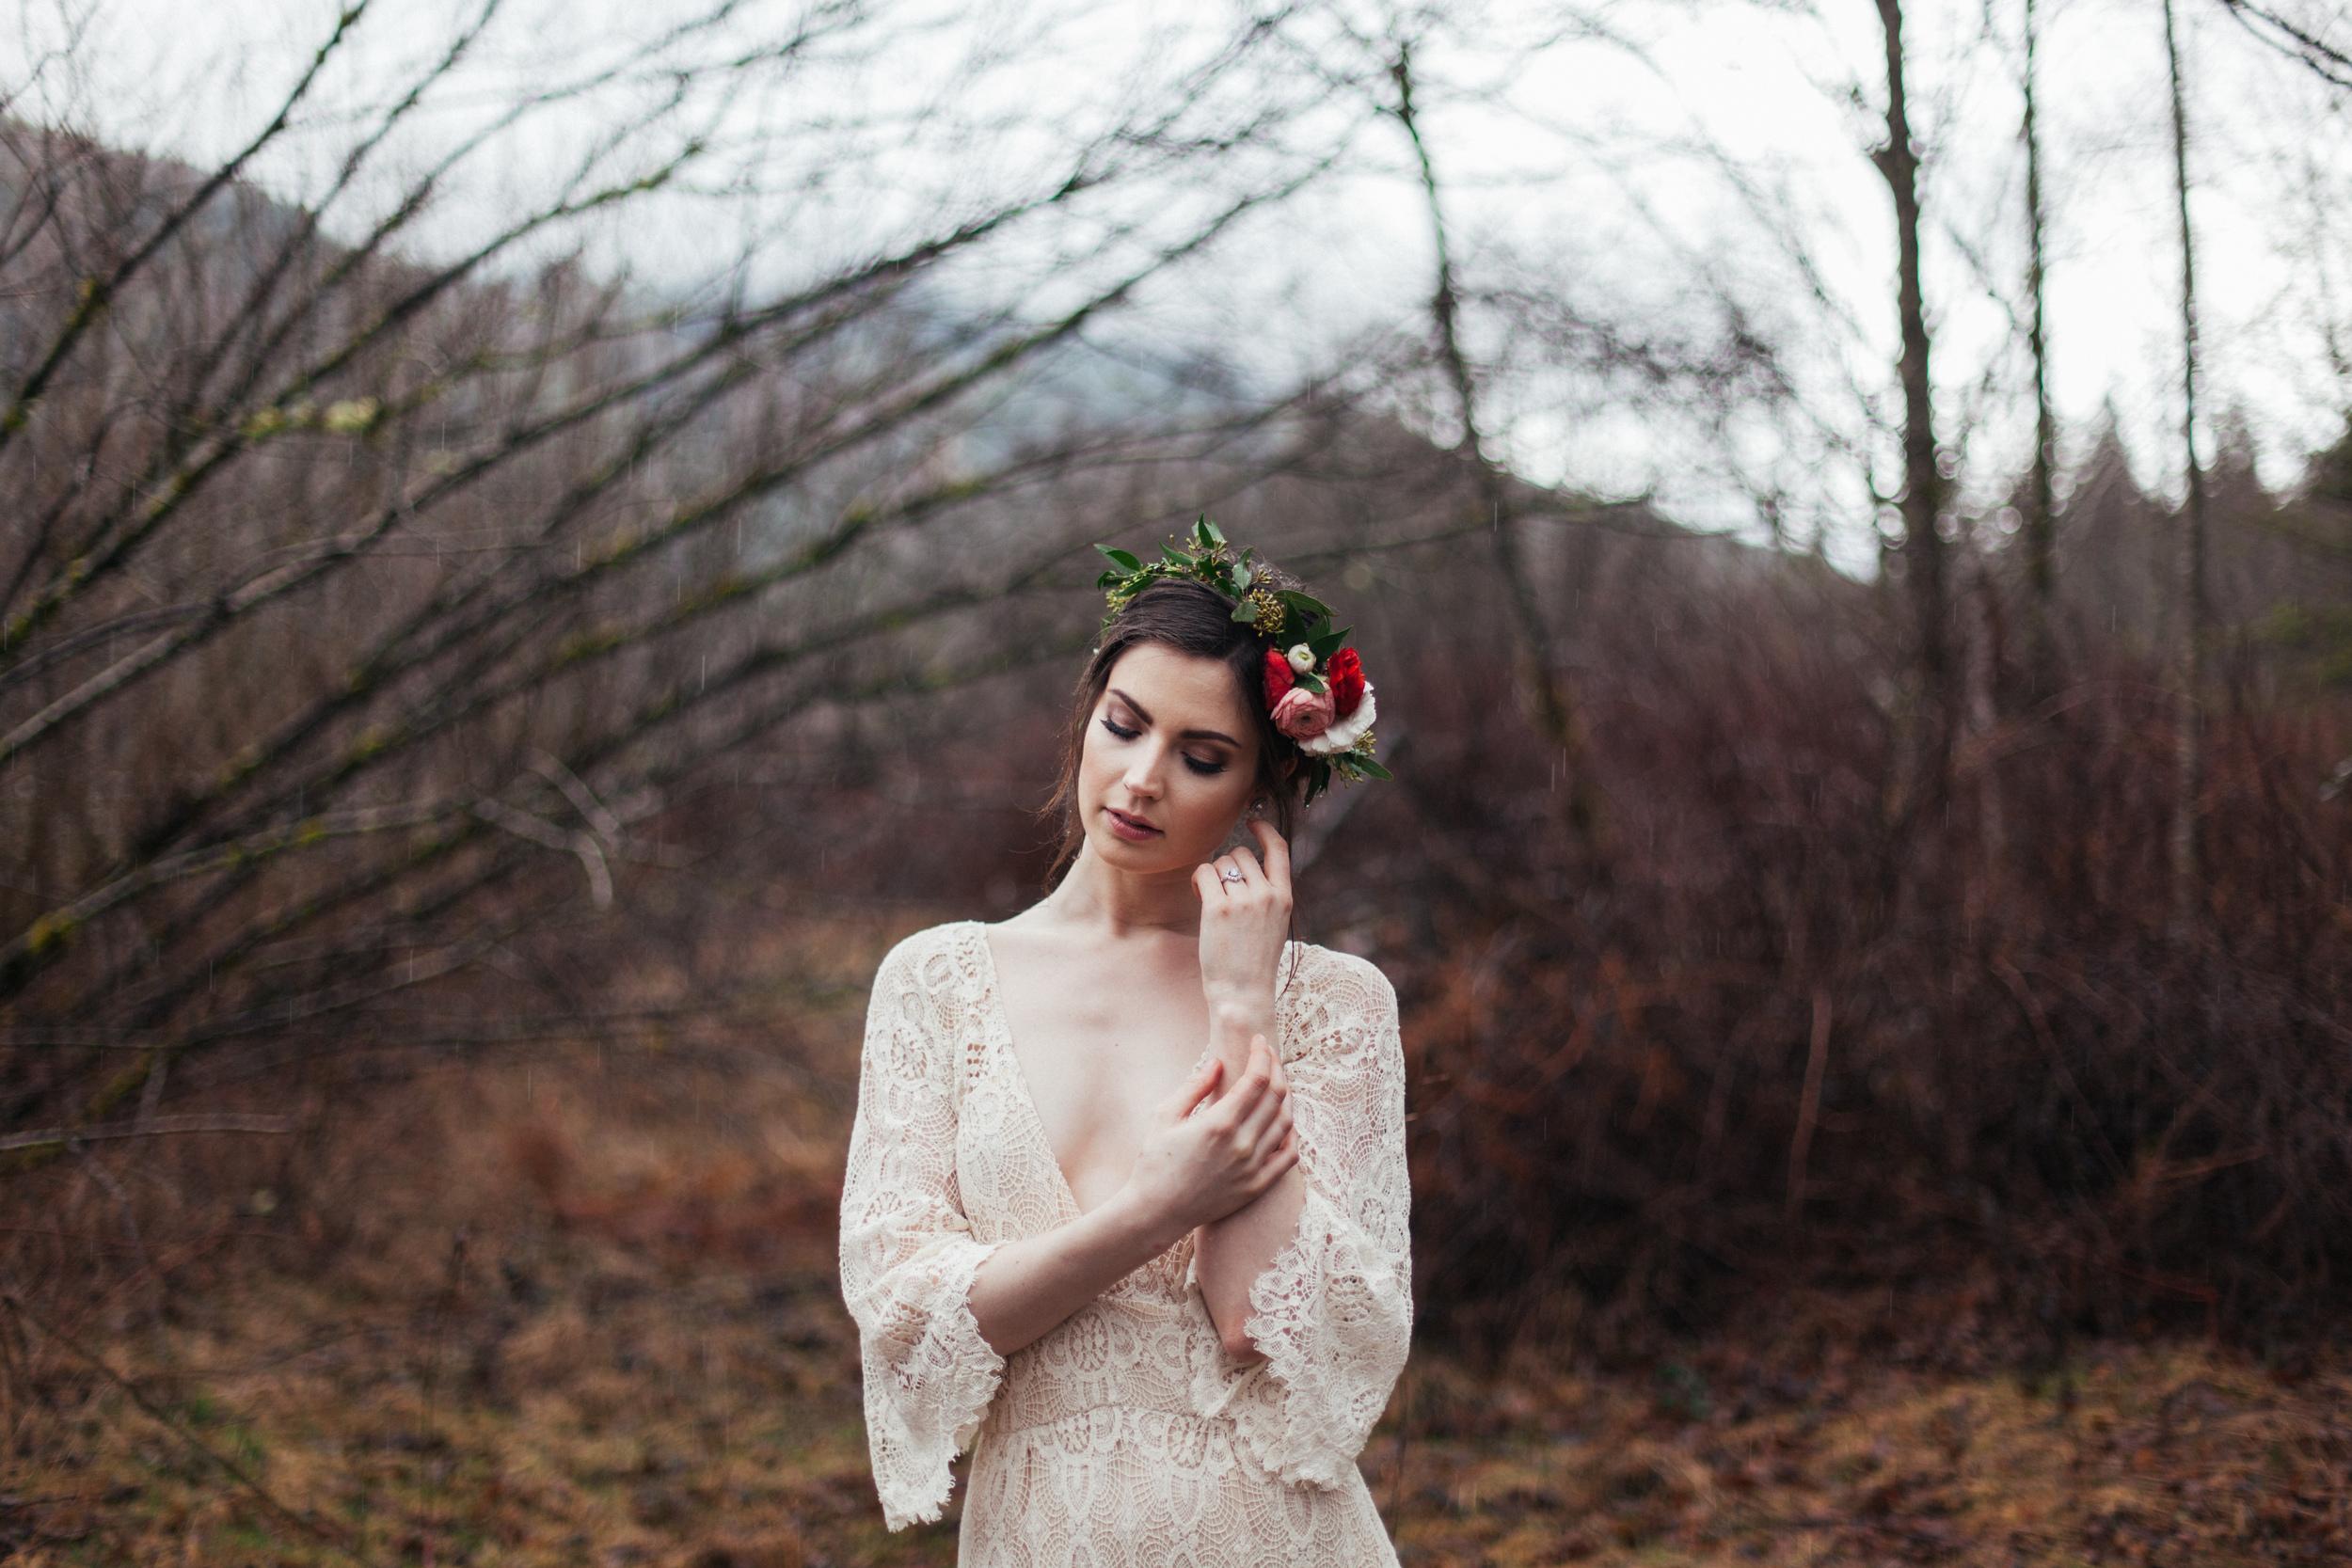 bridal_shoot_ (19 of 60).jpg